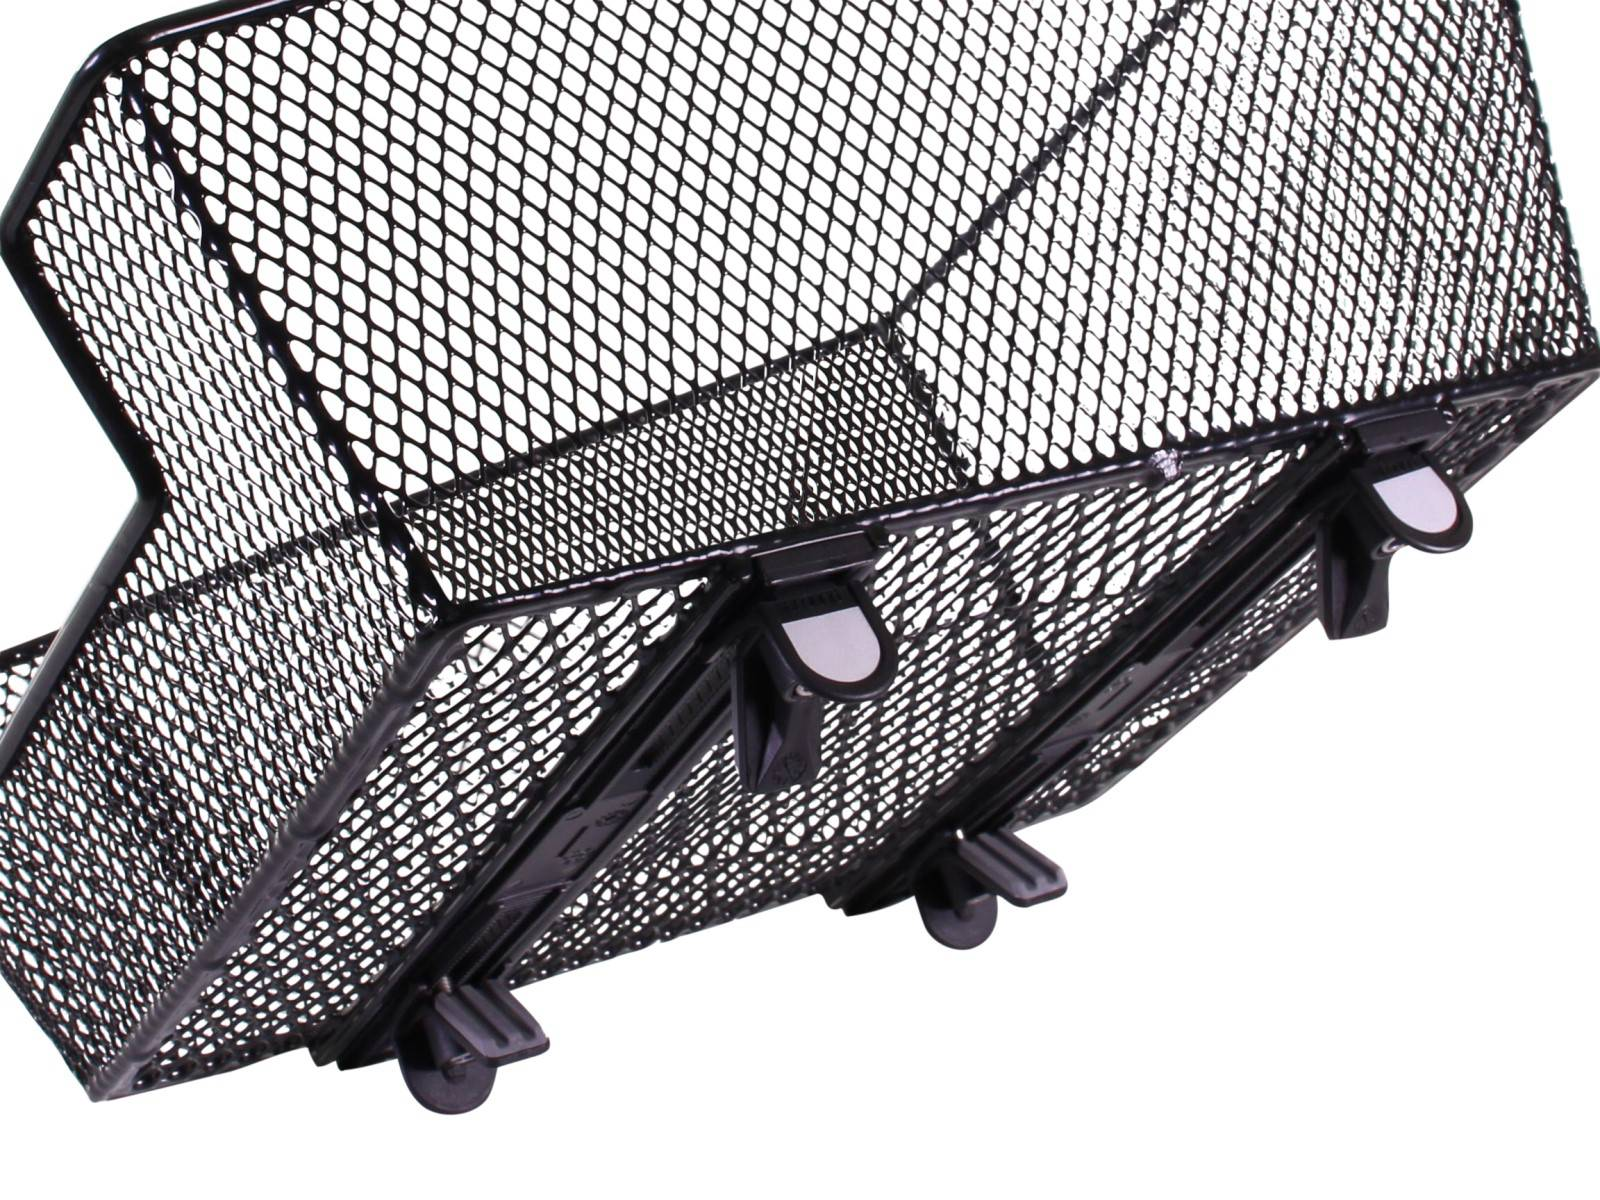 around fahrradkorb hinten college small basic fahrradkomfort. Black Bedroom Furniture Sets. Home Design Ideas